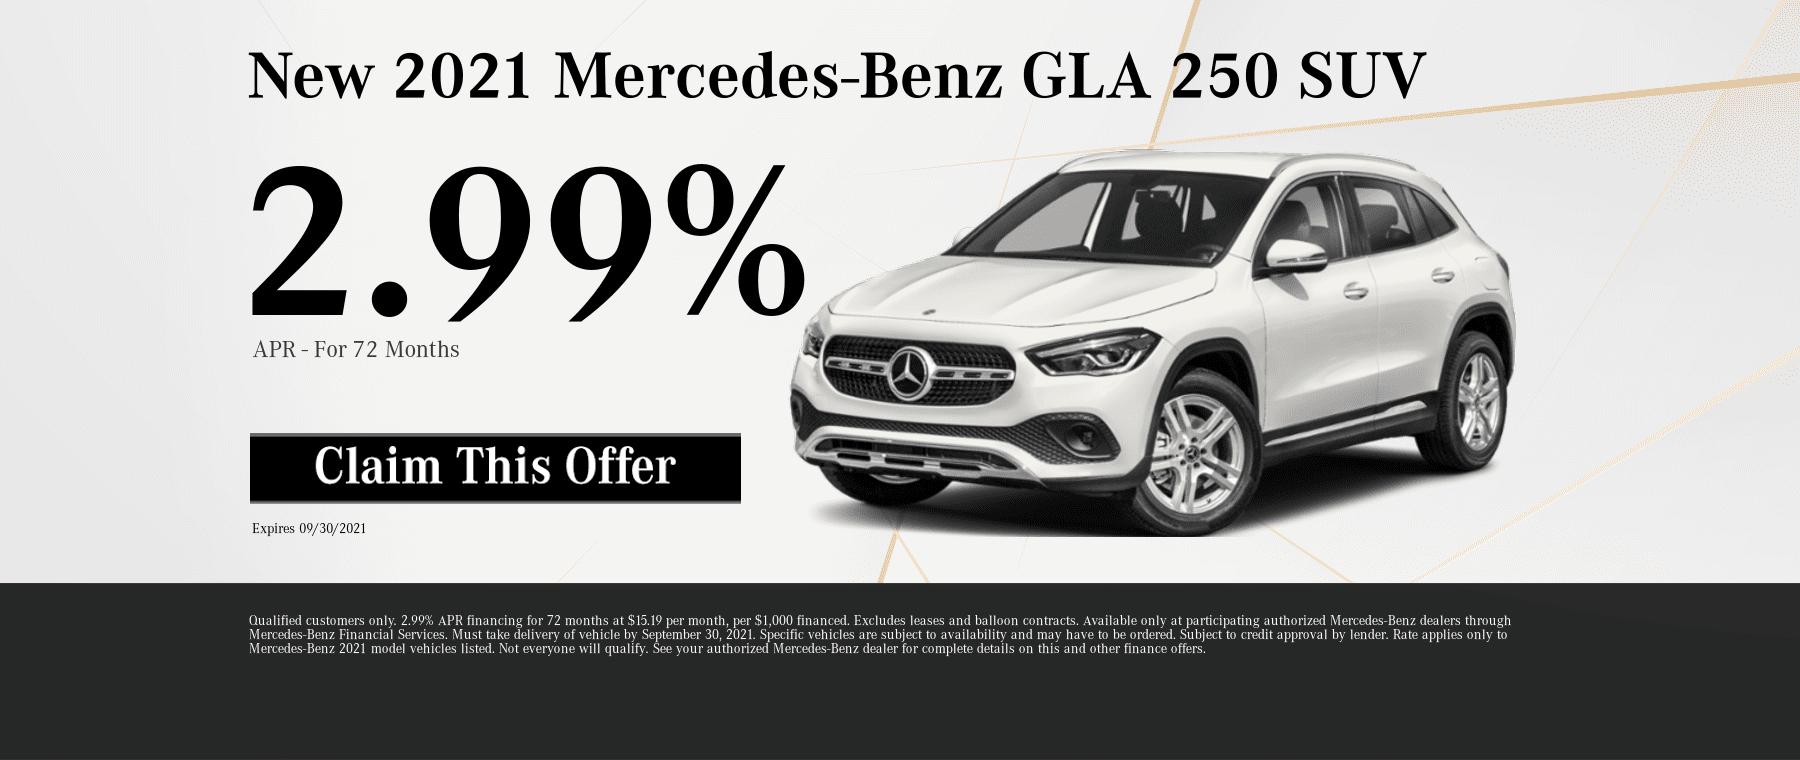 2021-Mercedes-Benz-GLA 250-SUV-GLA 250-SUV-59